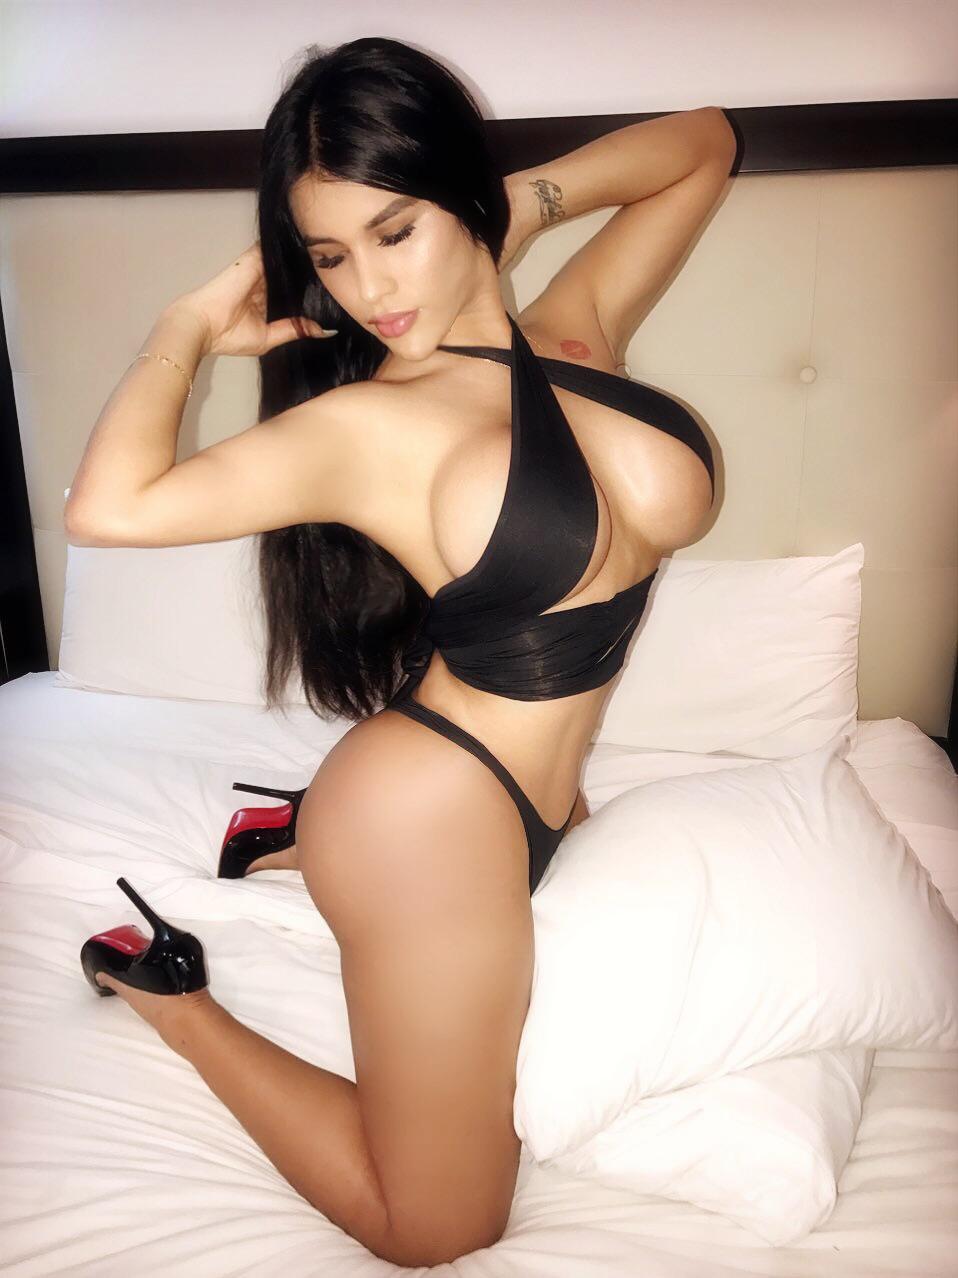 Escort girls Mexico